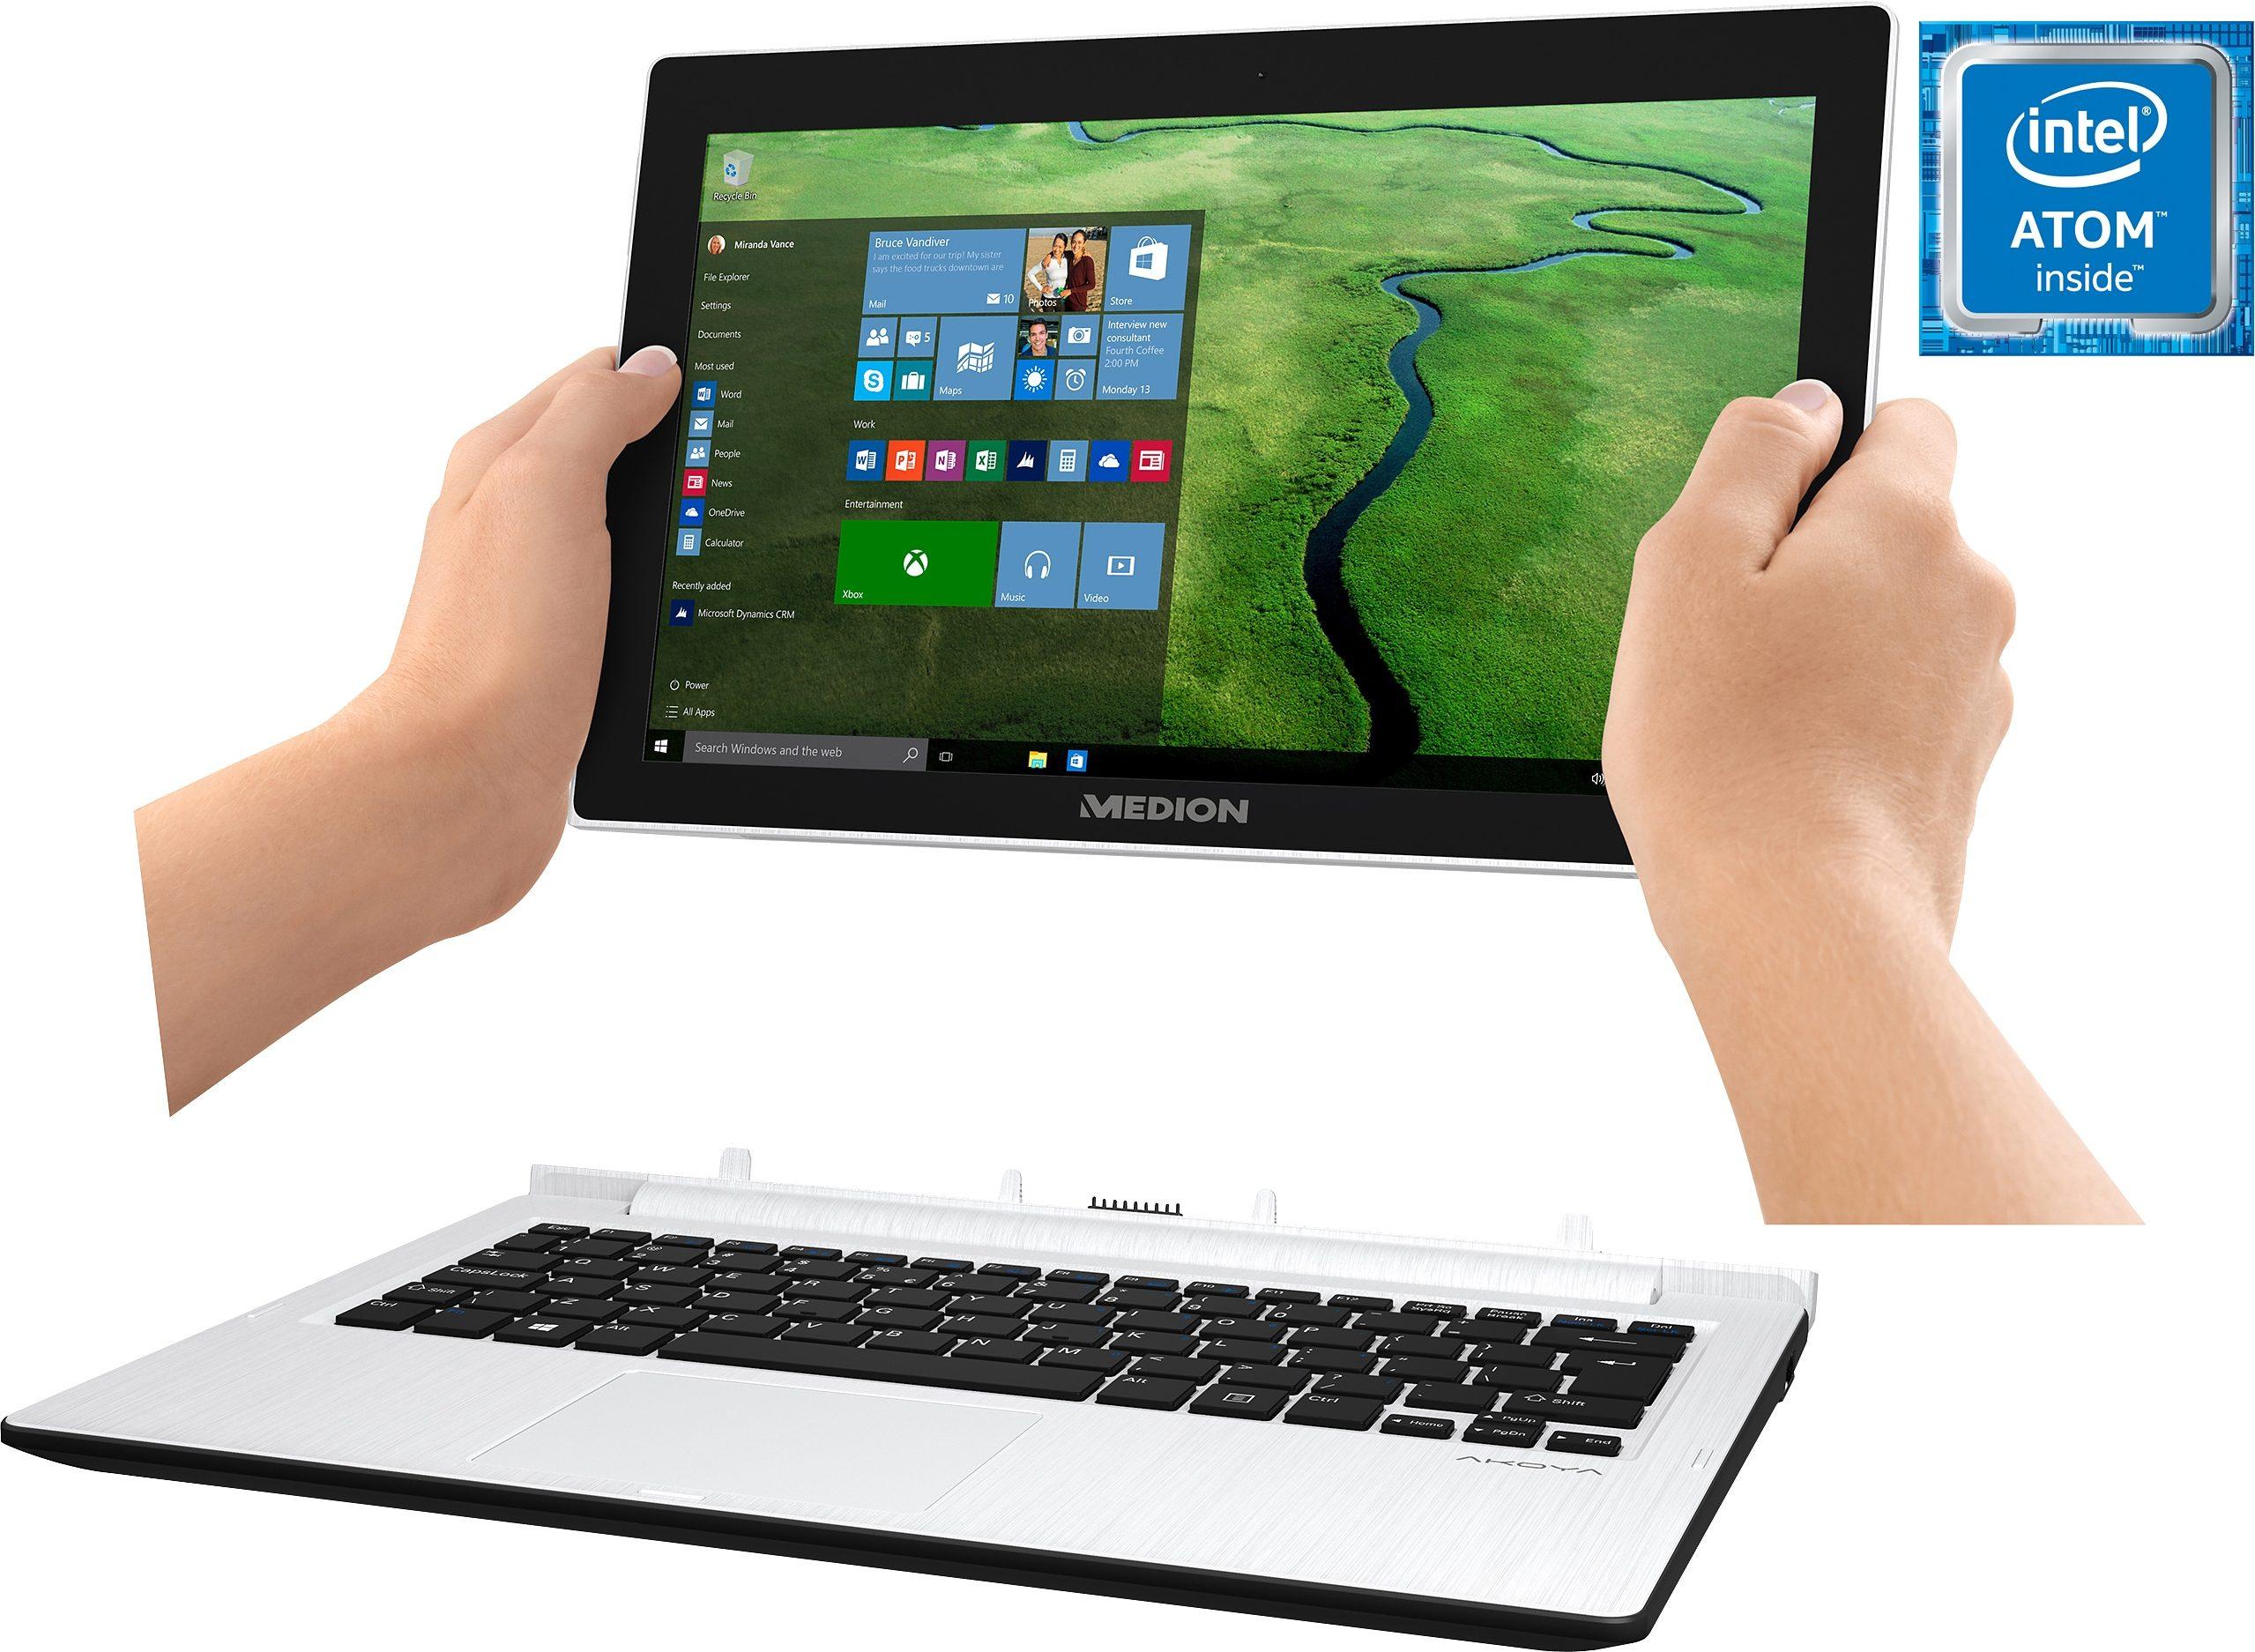 Medion® Akoya Convertible Notebook, Intel® Atom™, 29,5 cm (11,6 Zoll), 64 GB Speicher, 2048 MB